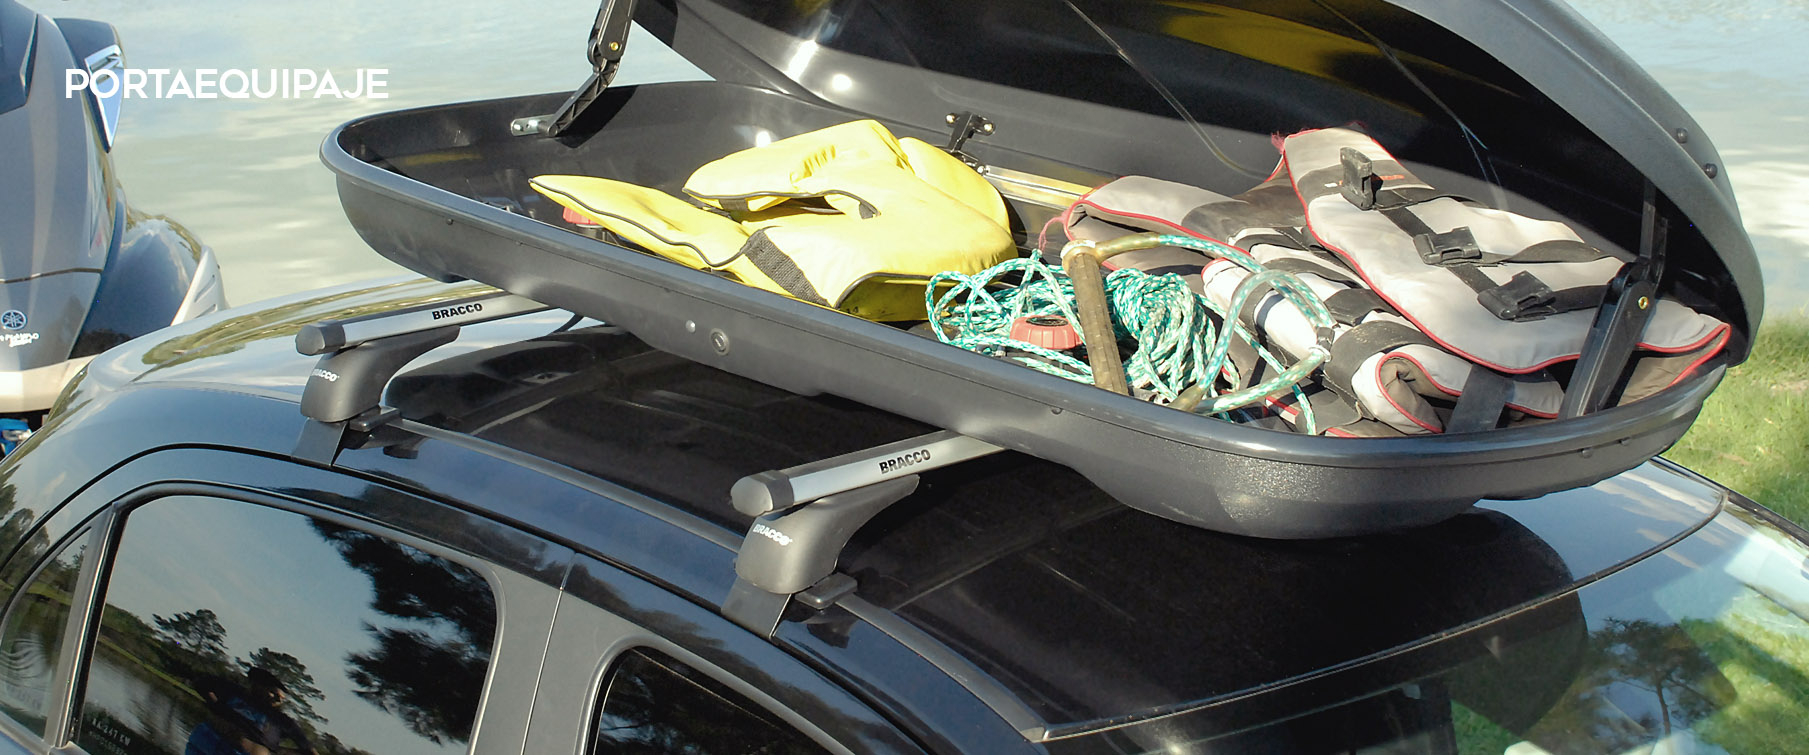 portaequipajes para automoviles bracco 2